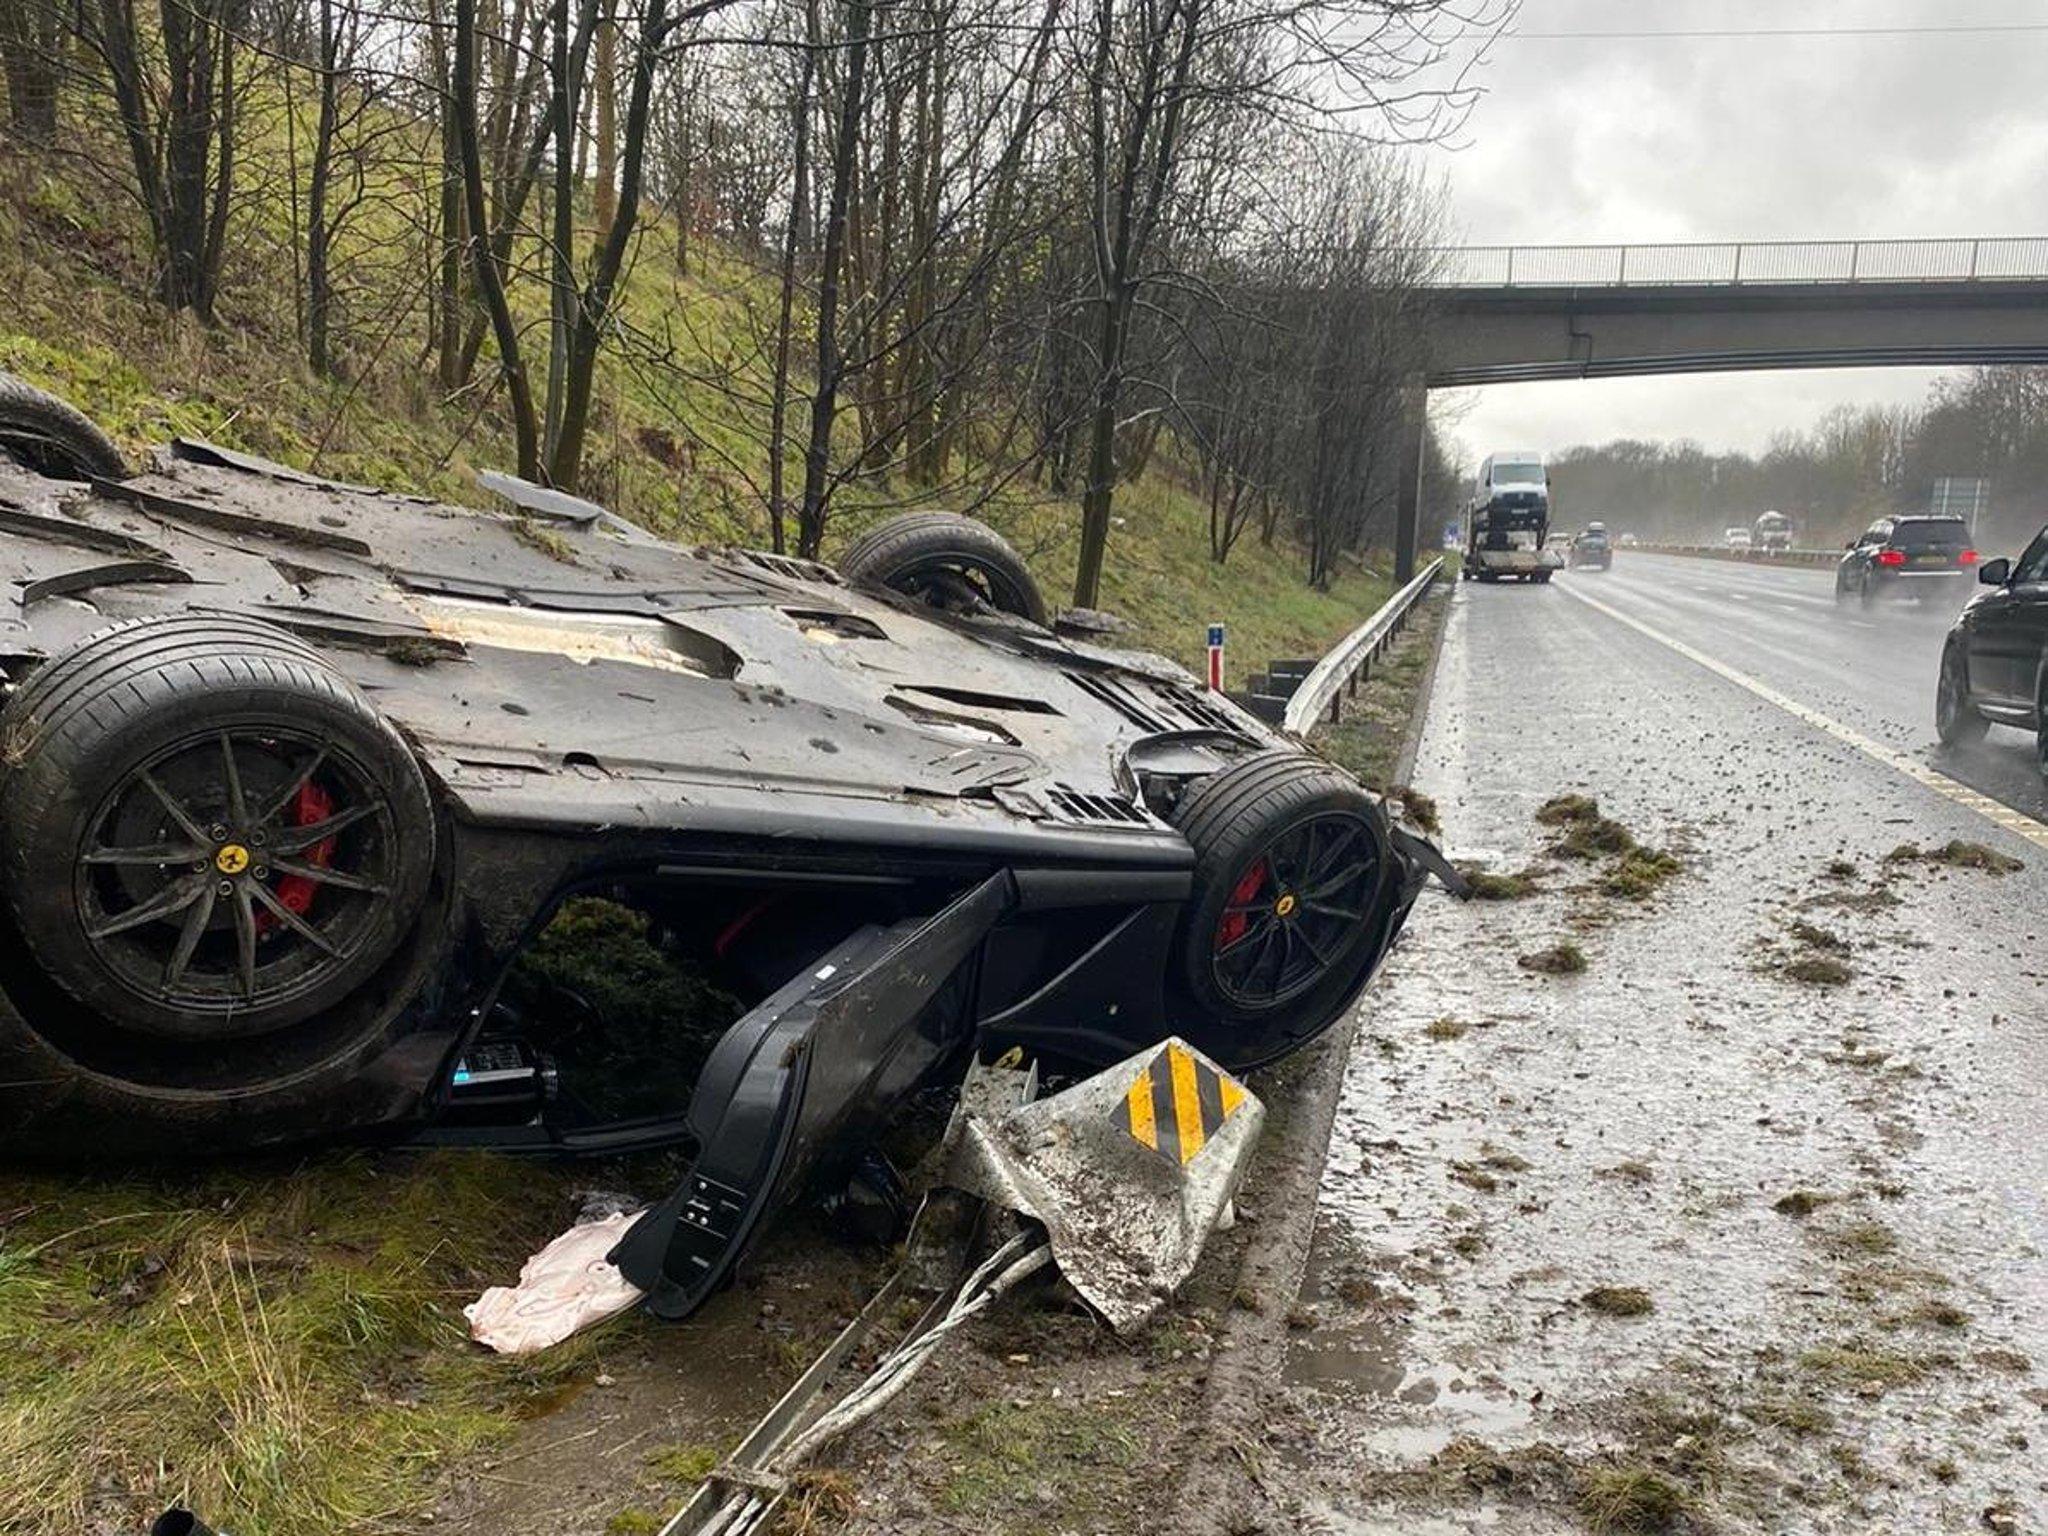 Shocking picture shows an overturned Ferrari after a crash on Leeds motorway